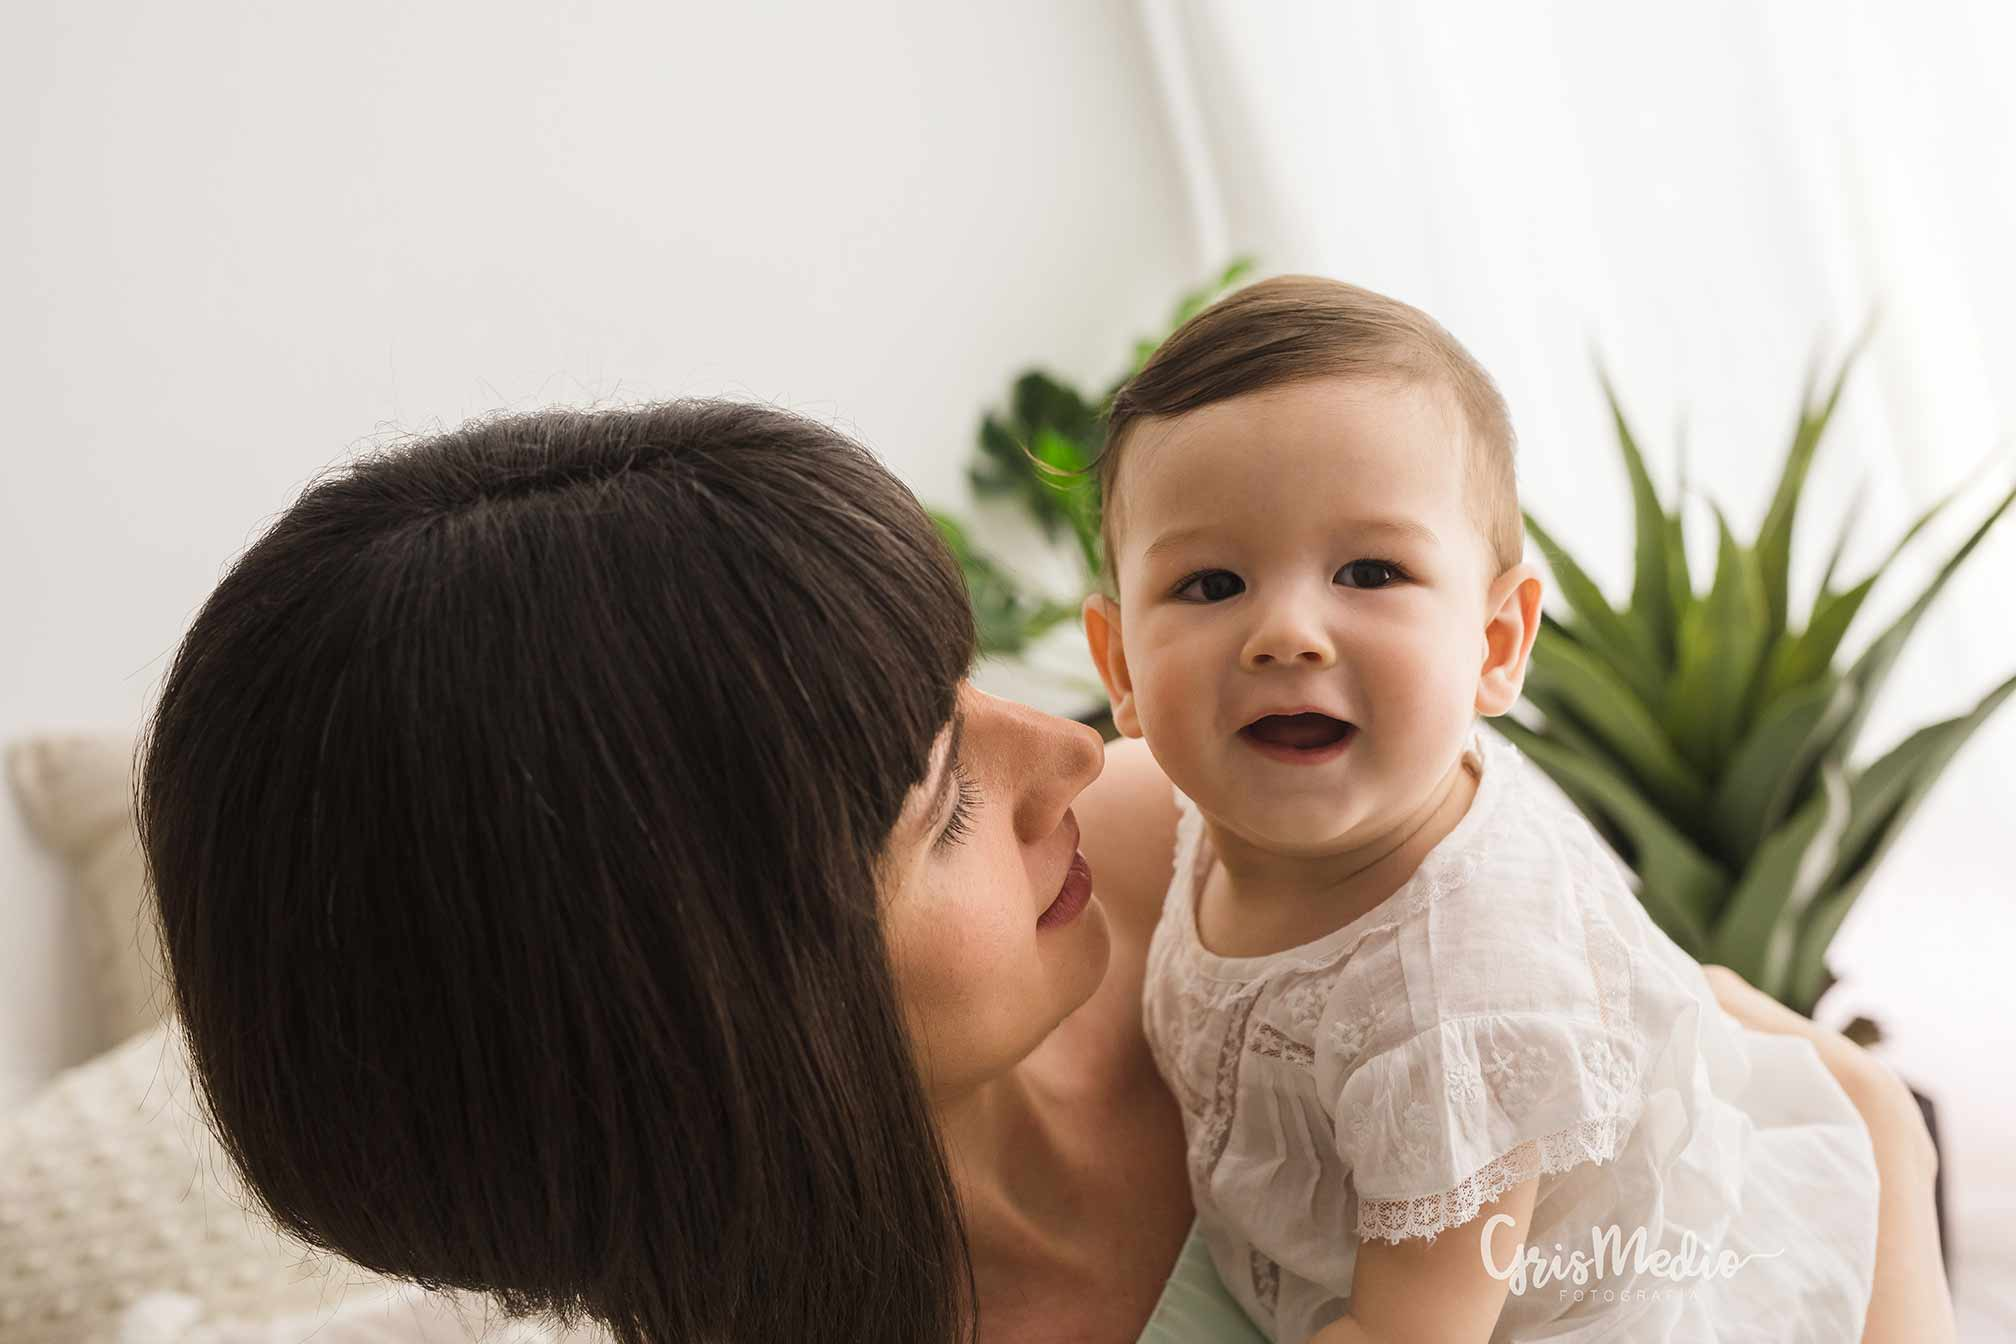 fotografia-familia-infantil-zaragoza-grismedio-bebe-lactancia7